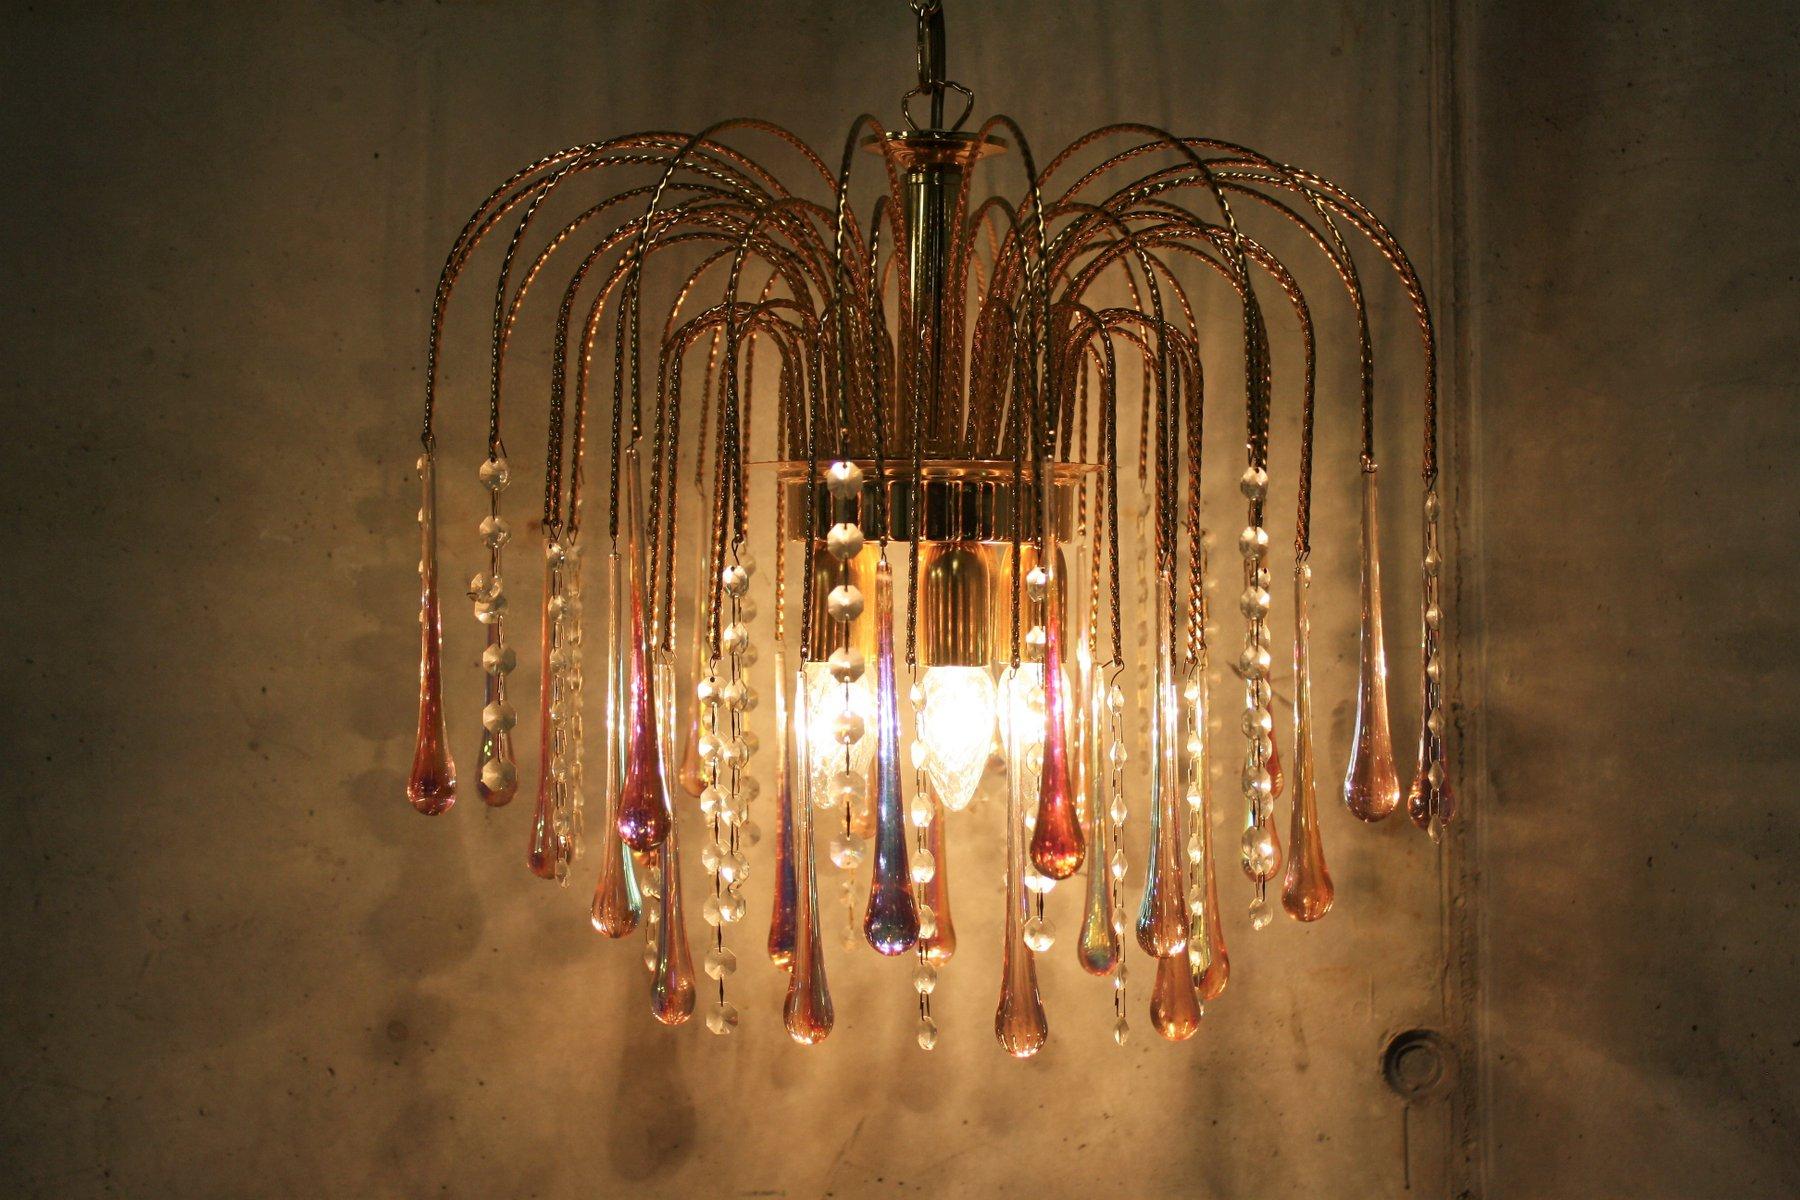 dennis ceiling lighting metal dering chandelier contemporary dual associates fuse chandeliers hall stem miller orange by alex